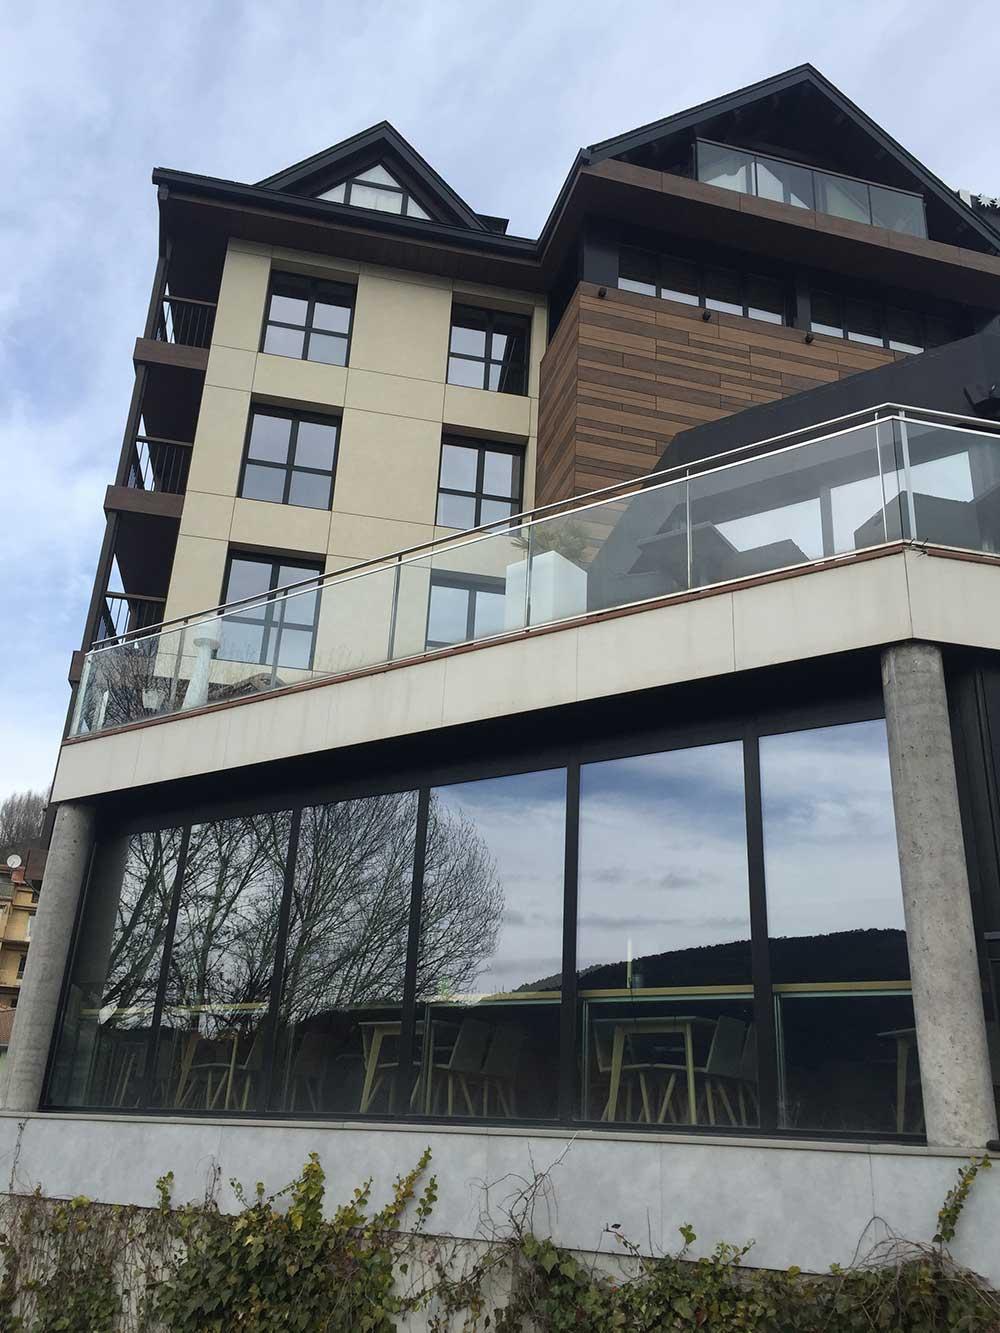 Galeria Hotel Sánchez en Ainsa, Huesca - 5 ?>